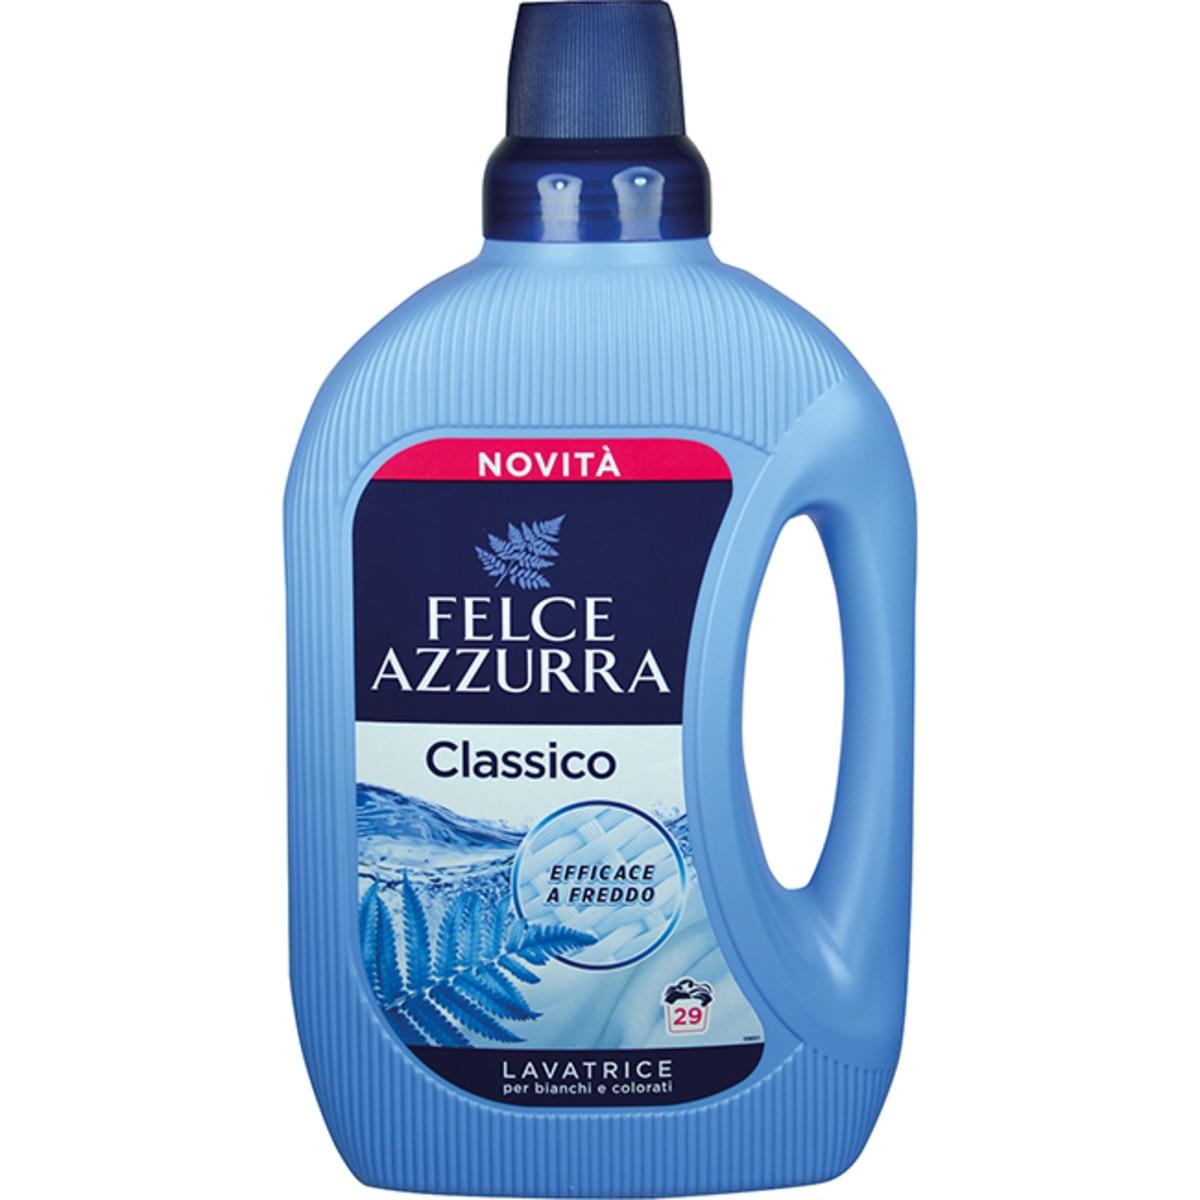 Felce Azzurra Detersivo Lavatrice Classico, prací gel 1,595 l., 29 pracích dávek